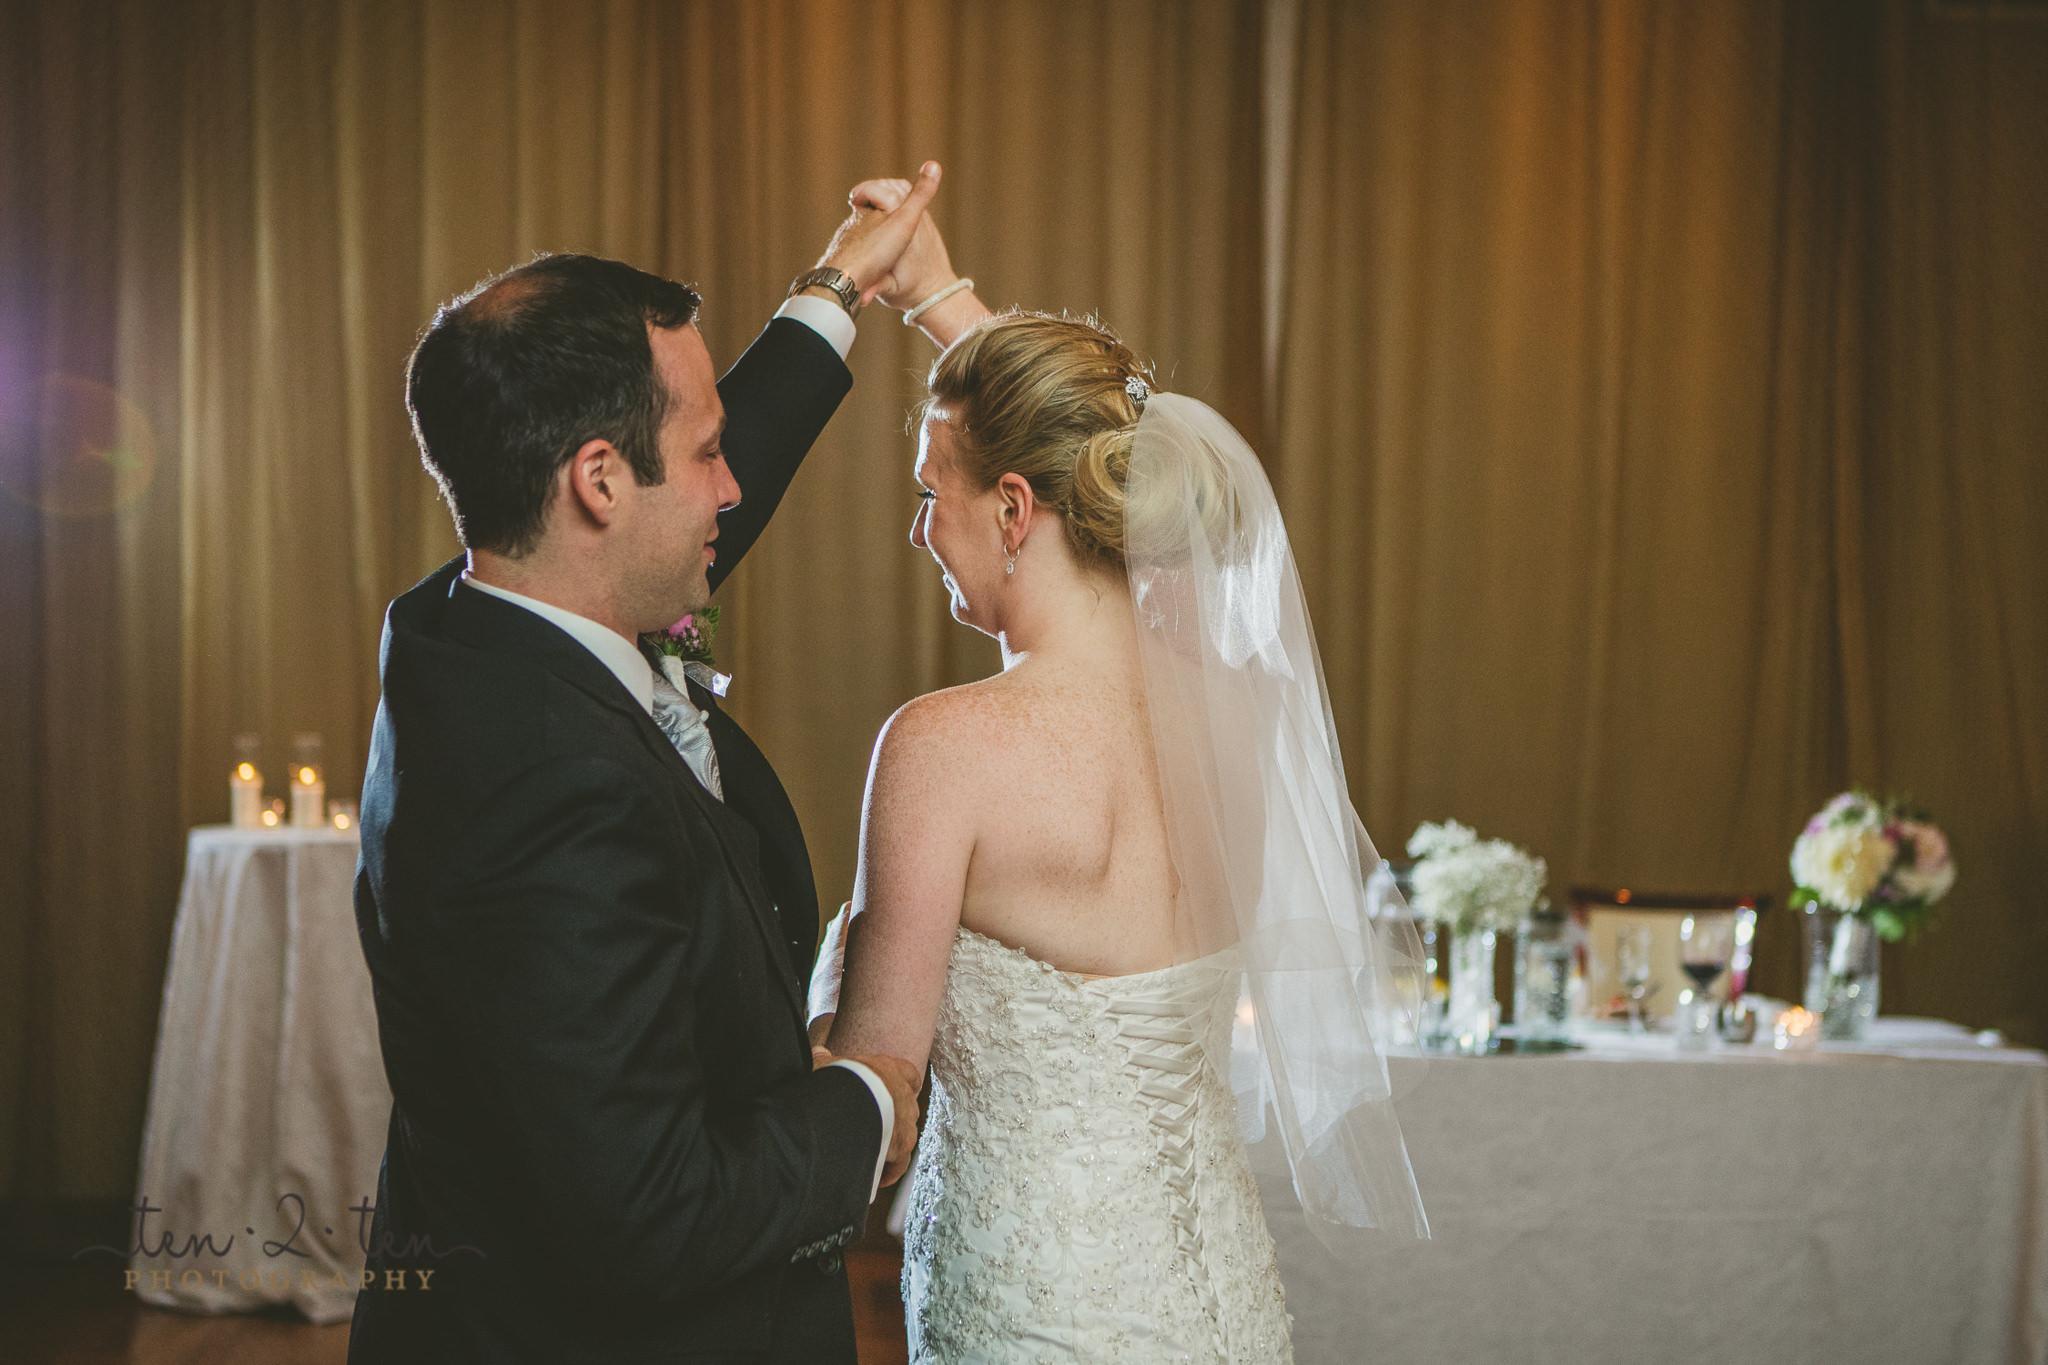 rosewater wedding photo, rosewater wedding photography, rosewater room wedding photos, rosewater room wedding, rosewater room wedding pictures, rosewater room wedding photography